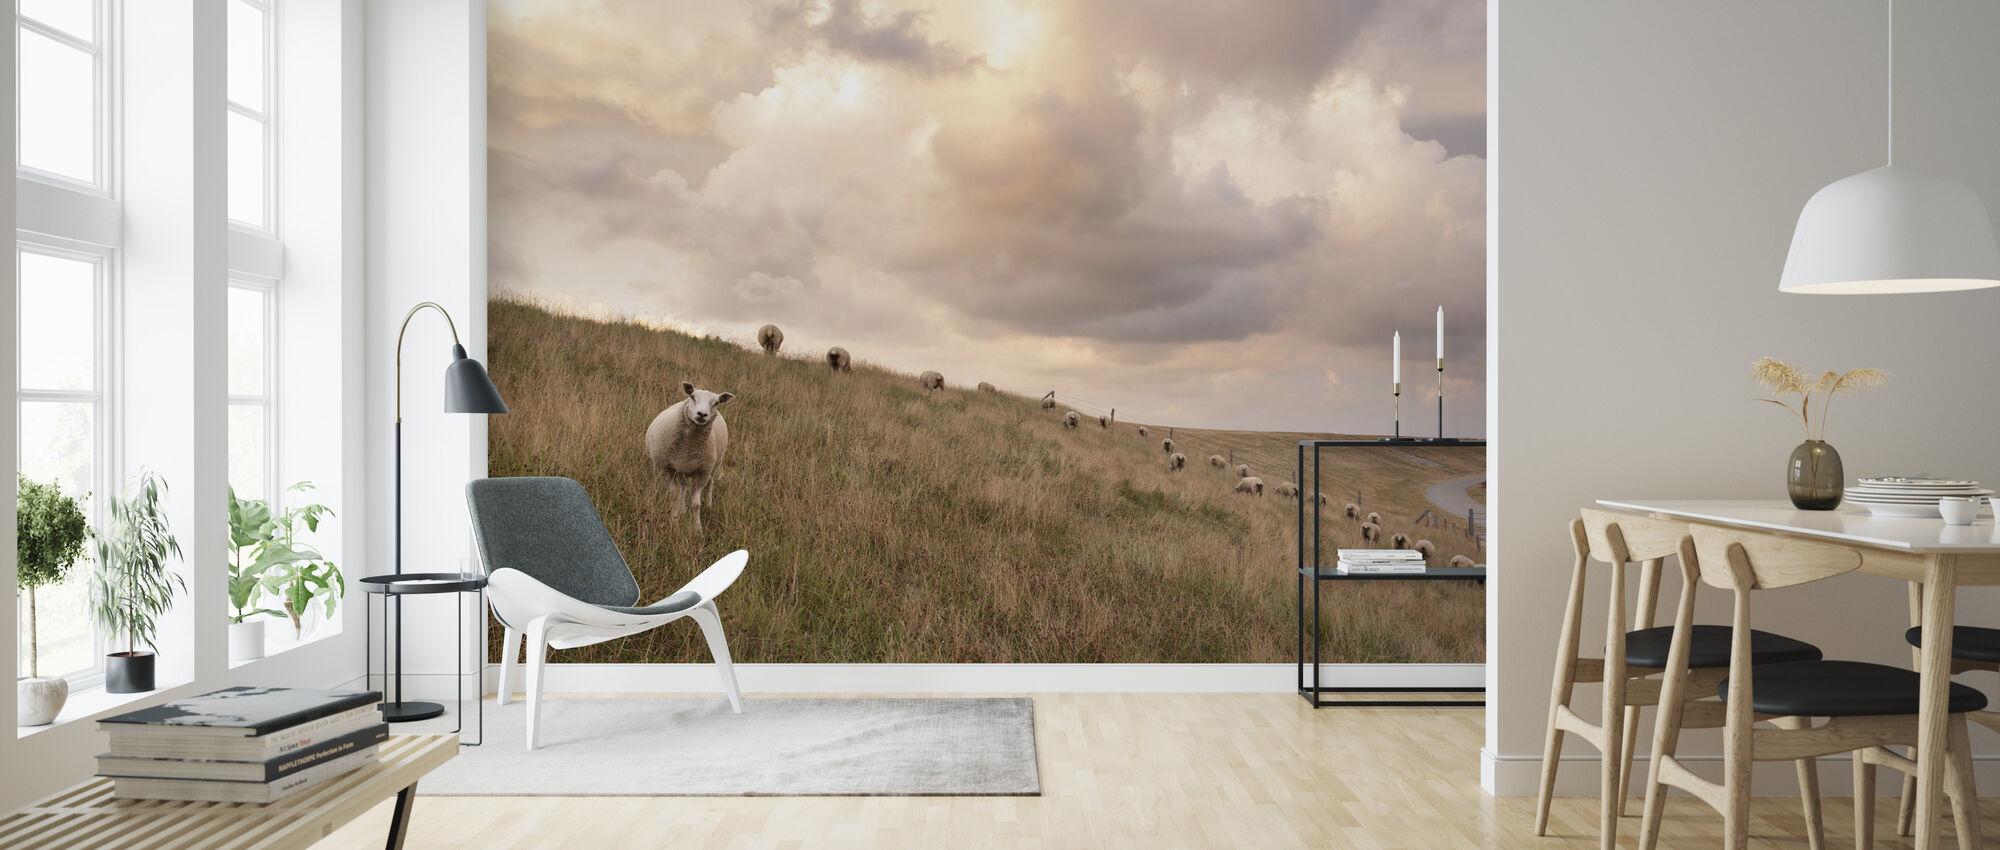 Attentive Sheep - Wallpaper - Living Room